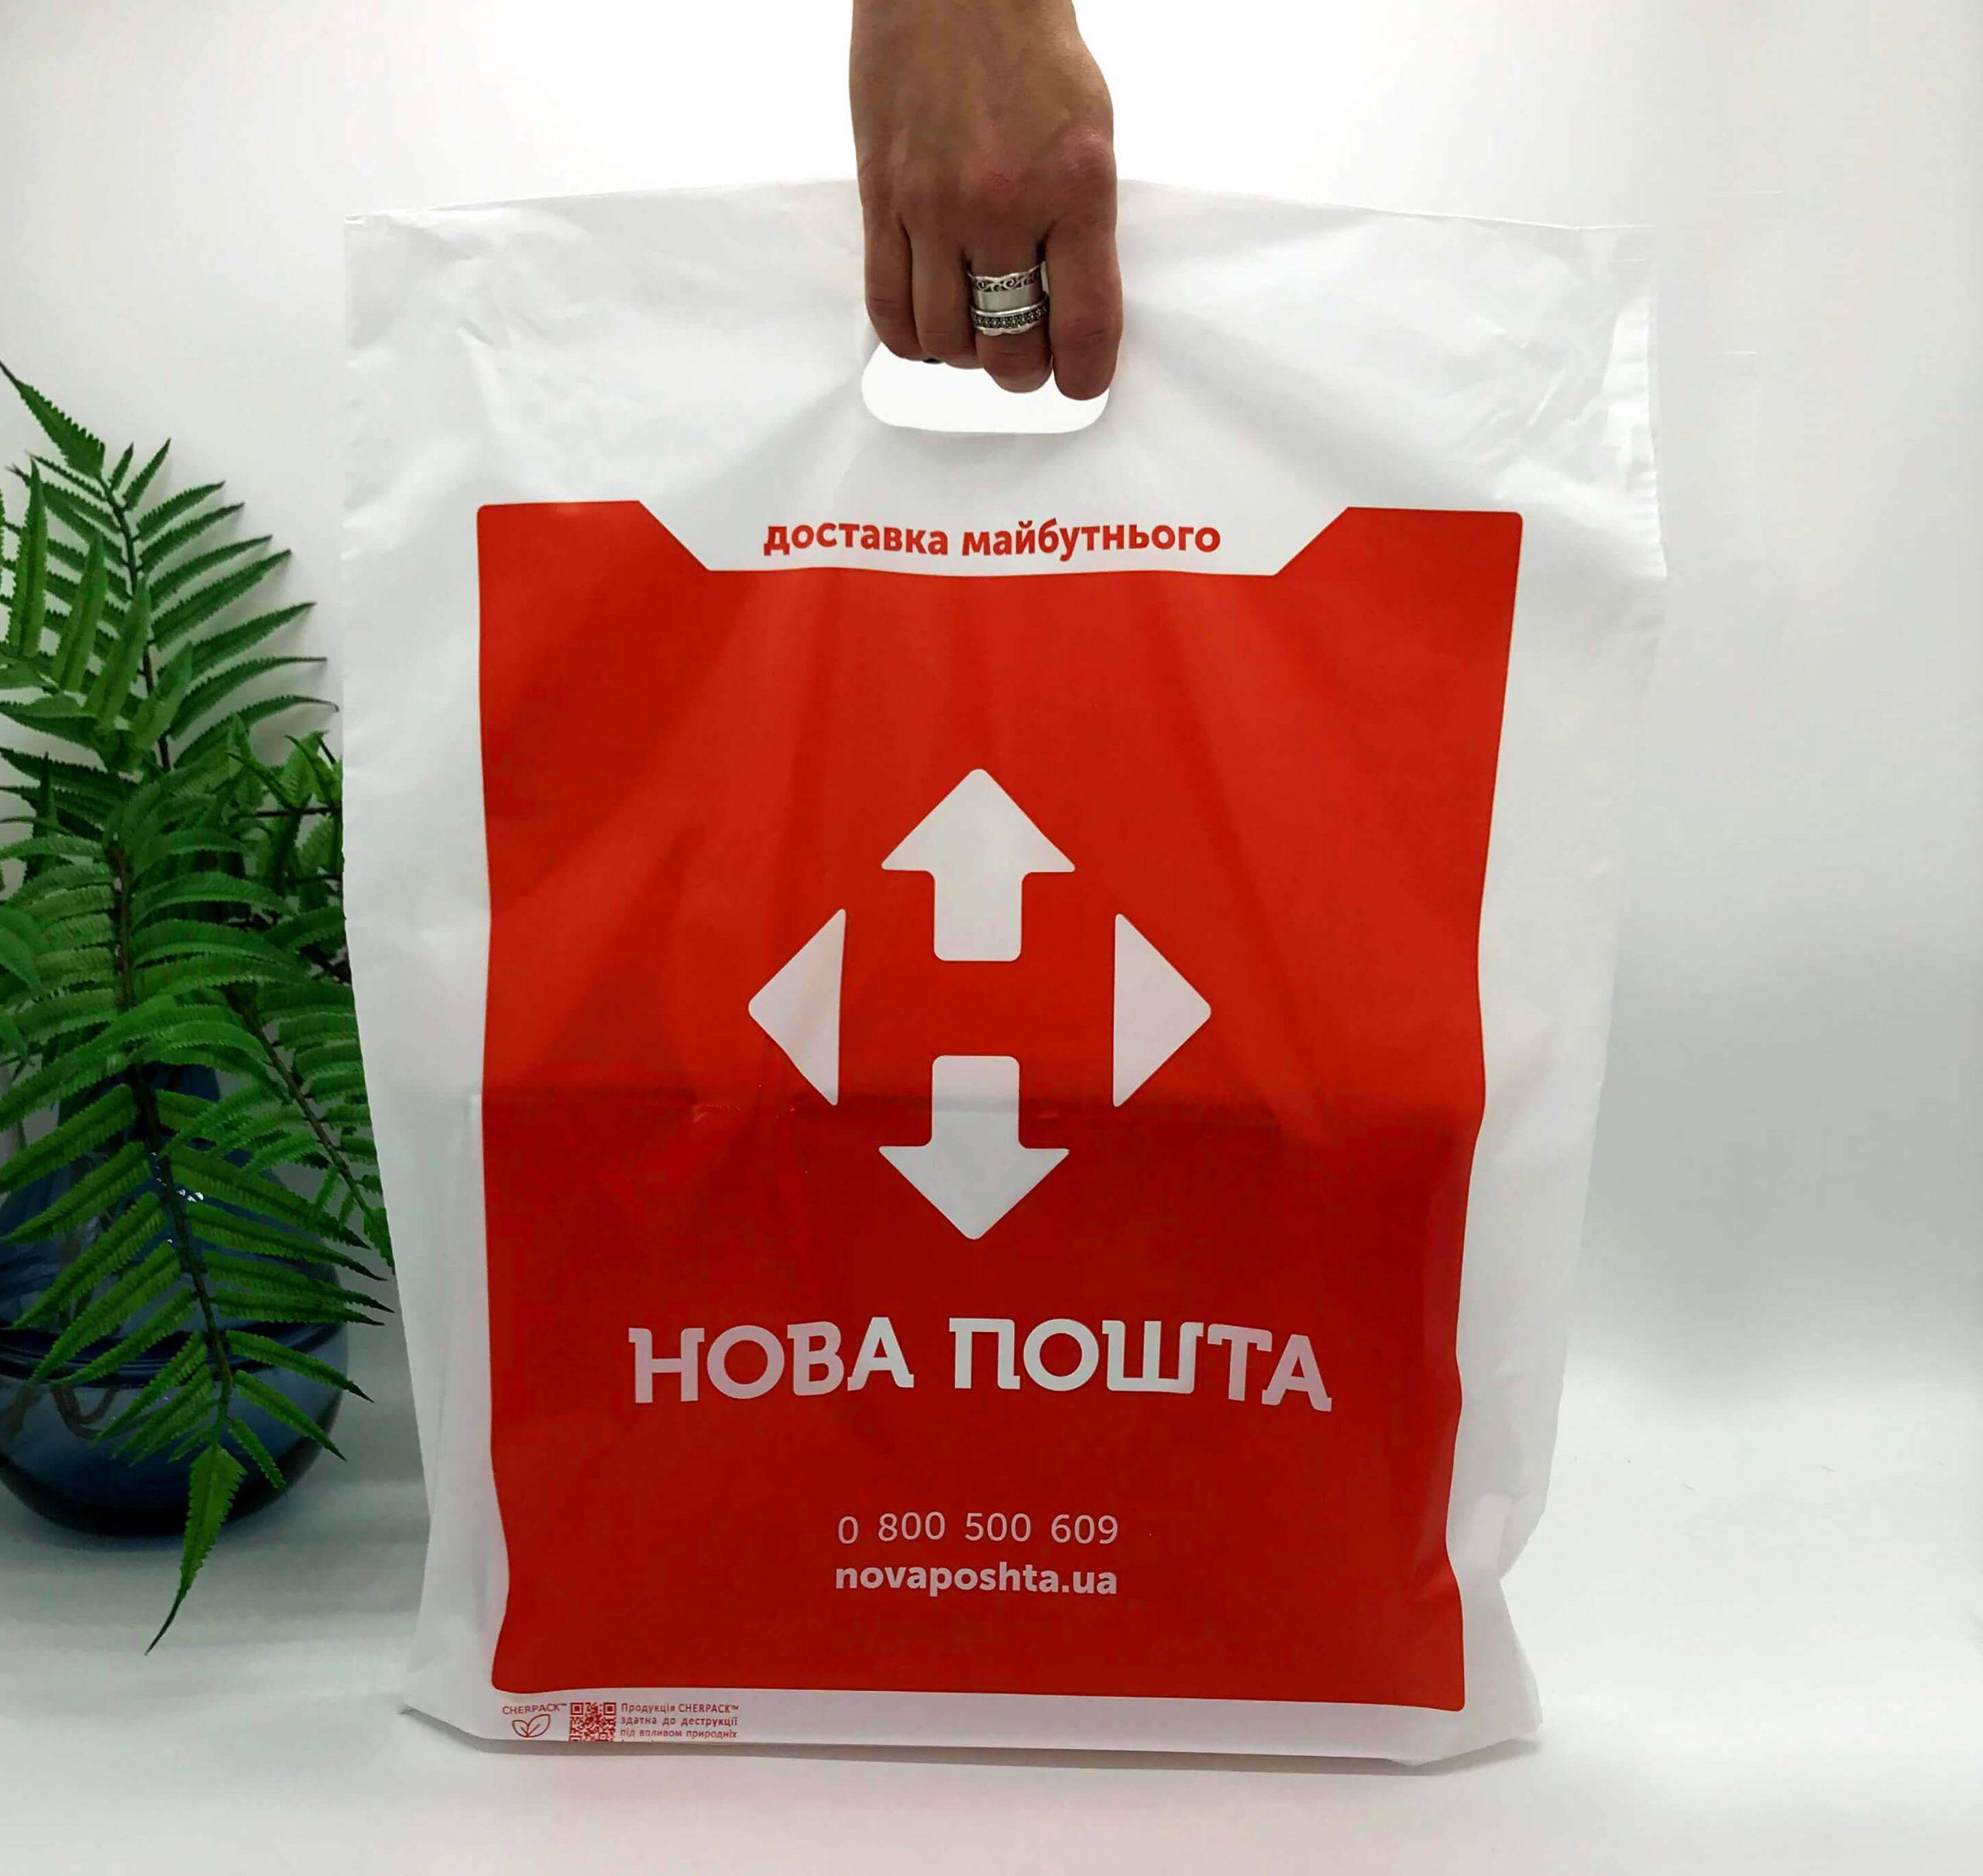 Логотип на пакете «Новая почта»